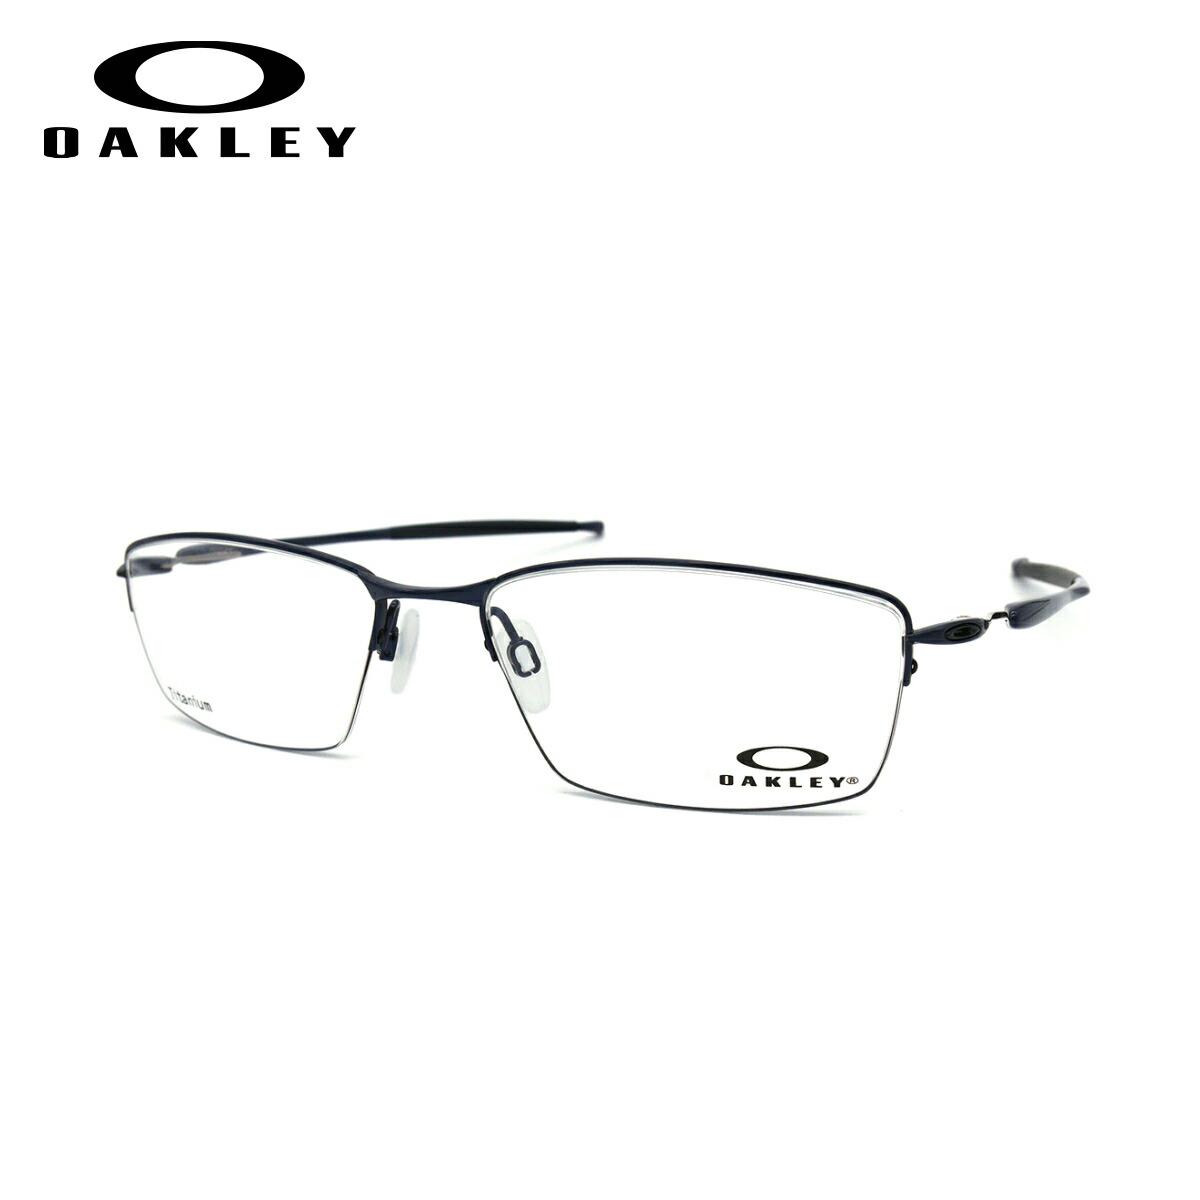 OAKLEY LIZARD OX5113-0456 オークリー リザード メガネフレーム 度付き対応 チタン オプサルミック 眼鏡 フレーム 軽い メンズ 【送料無料】